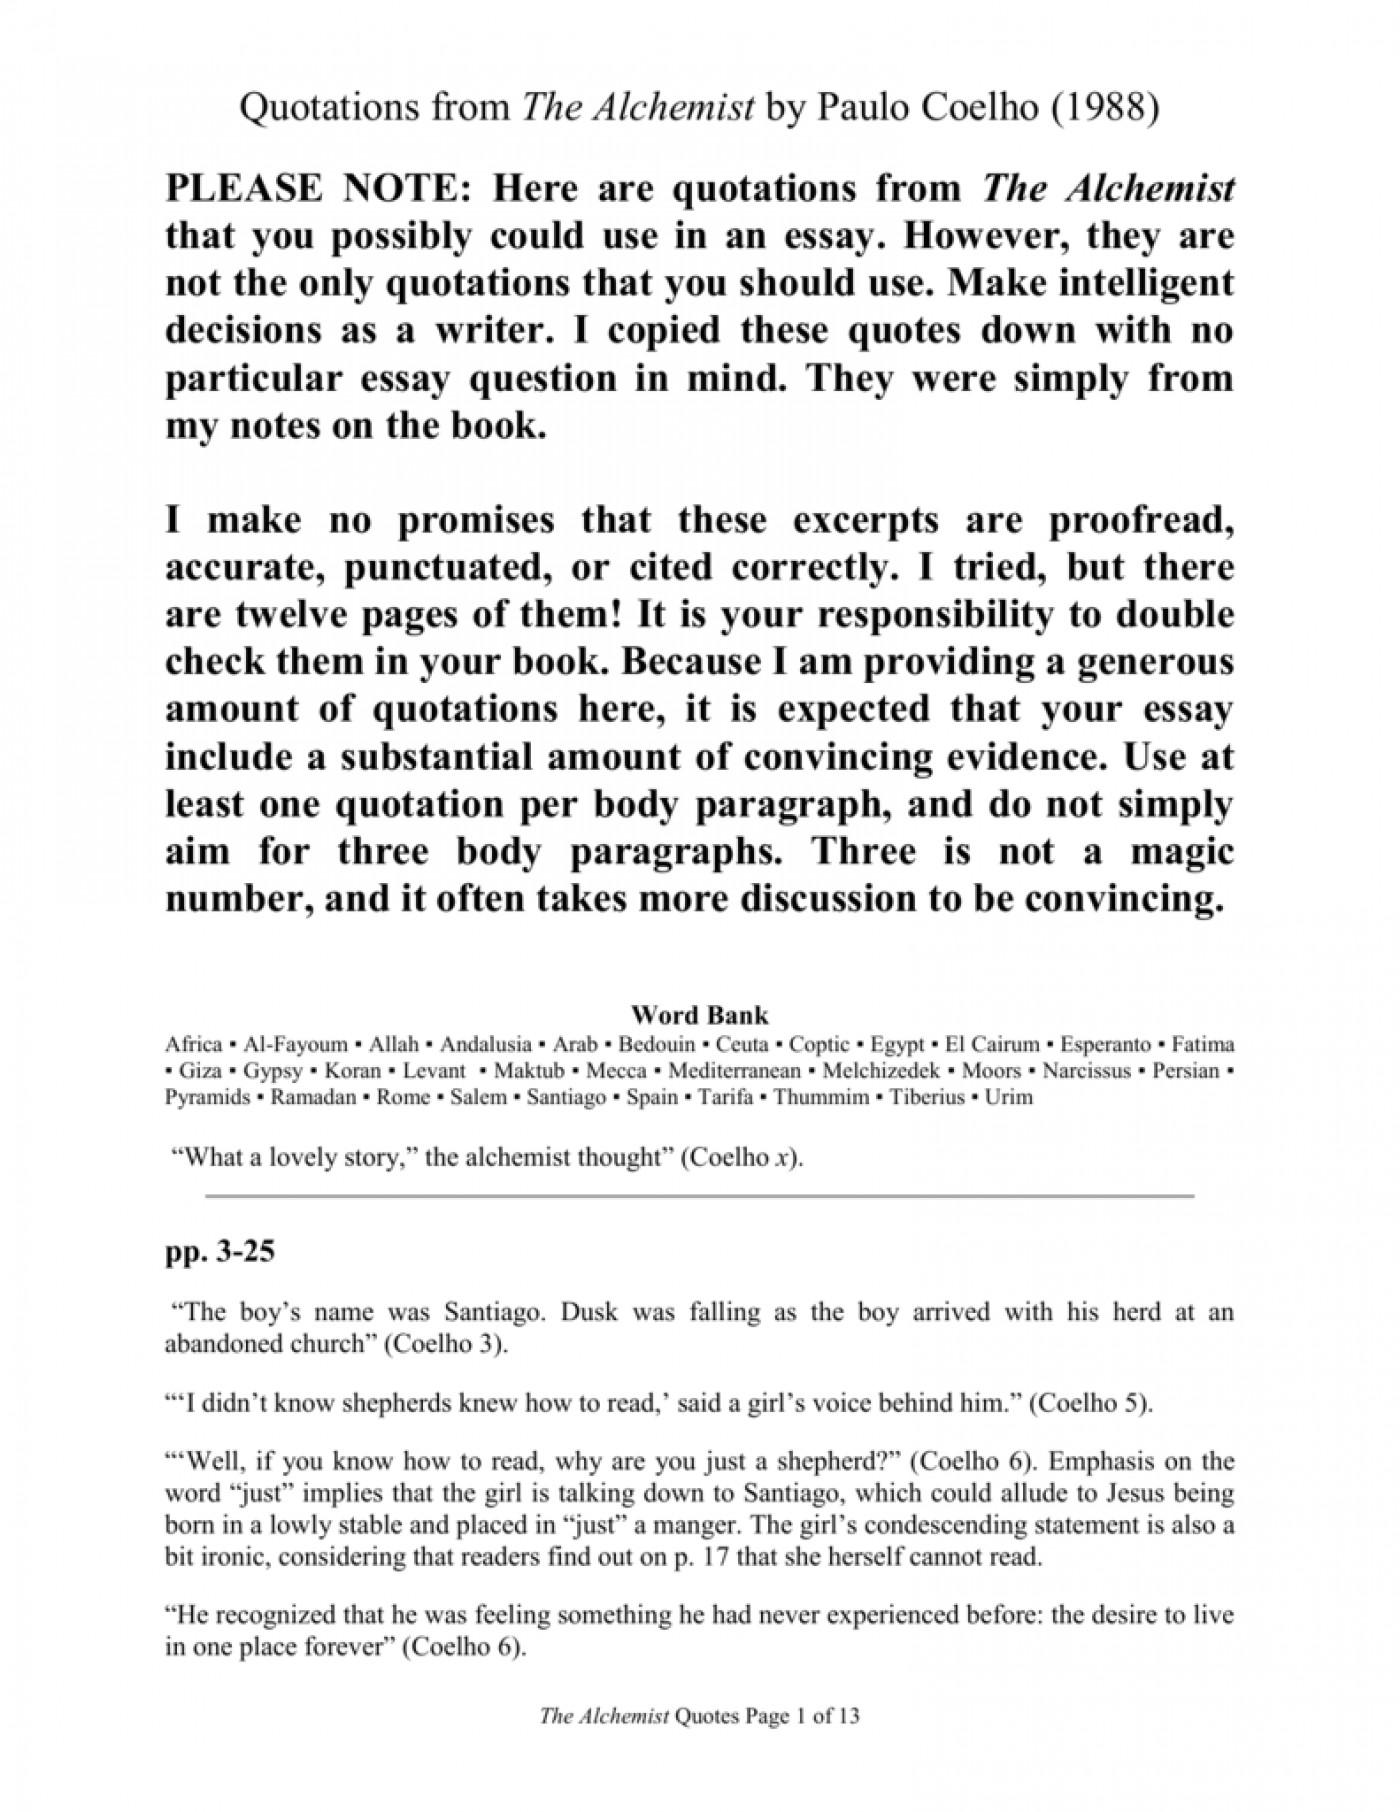 003 006831781 1 Essay Example The Remarkable Alchemist Ben Jonson Questions Outline Thesis 1400